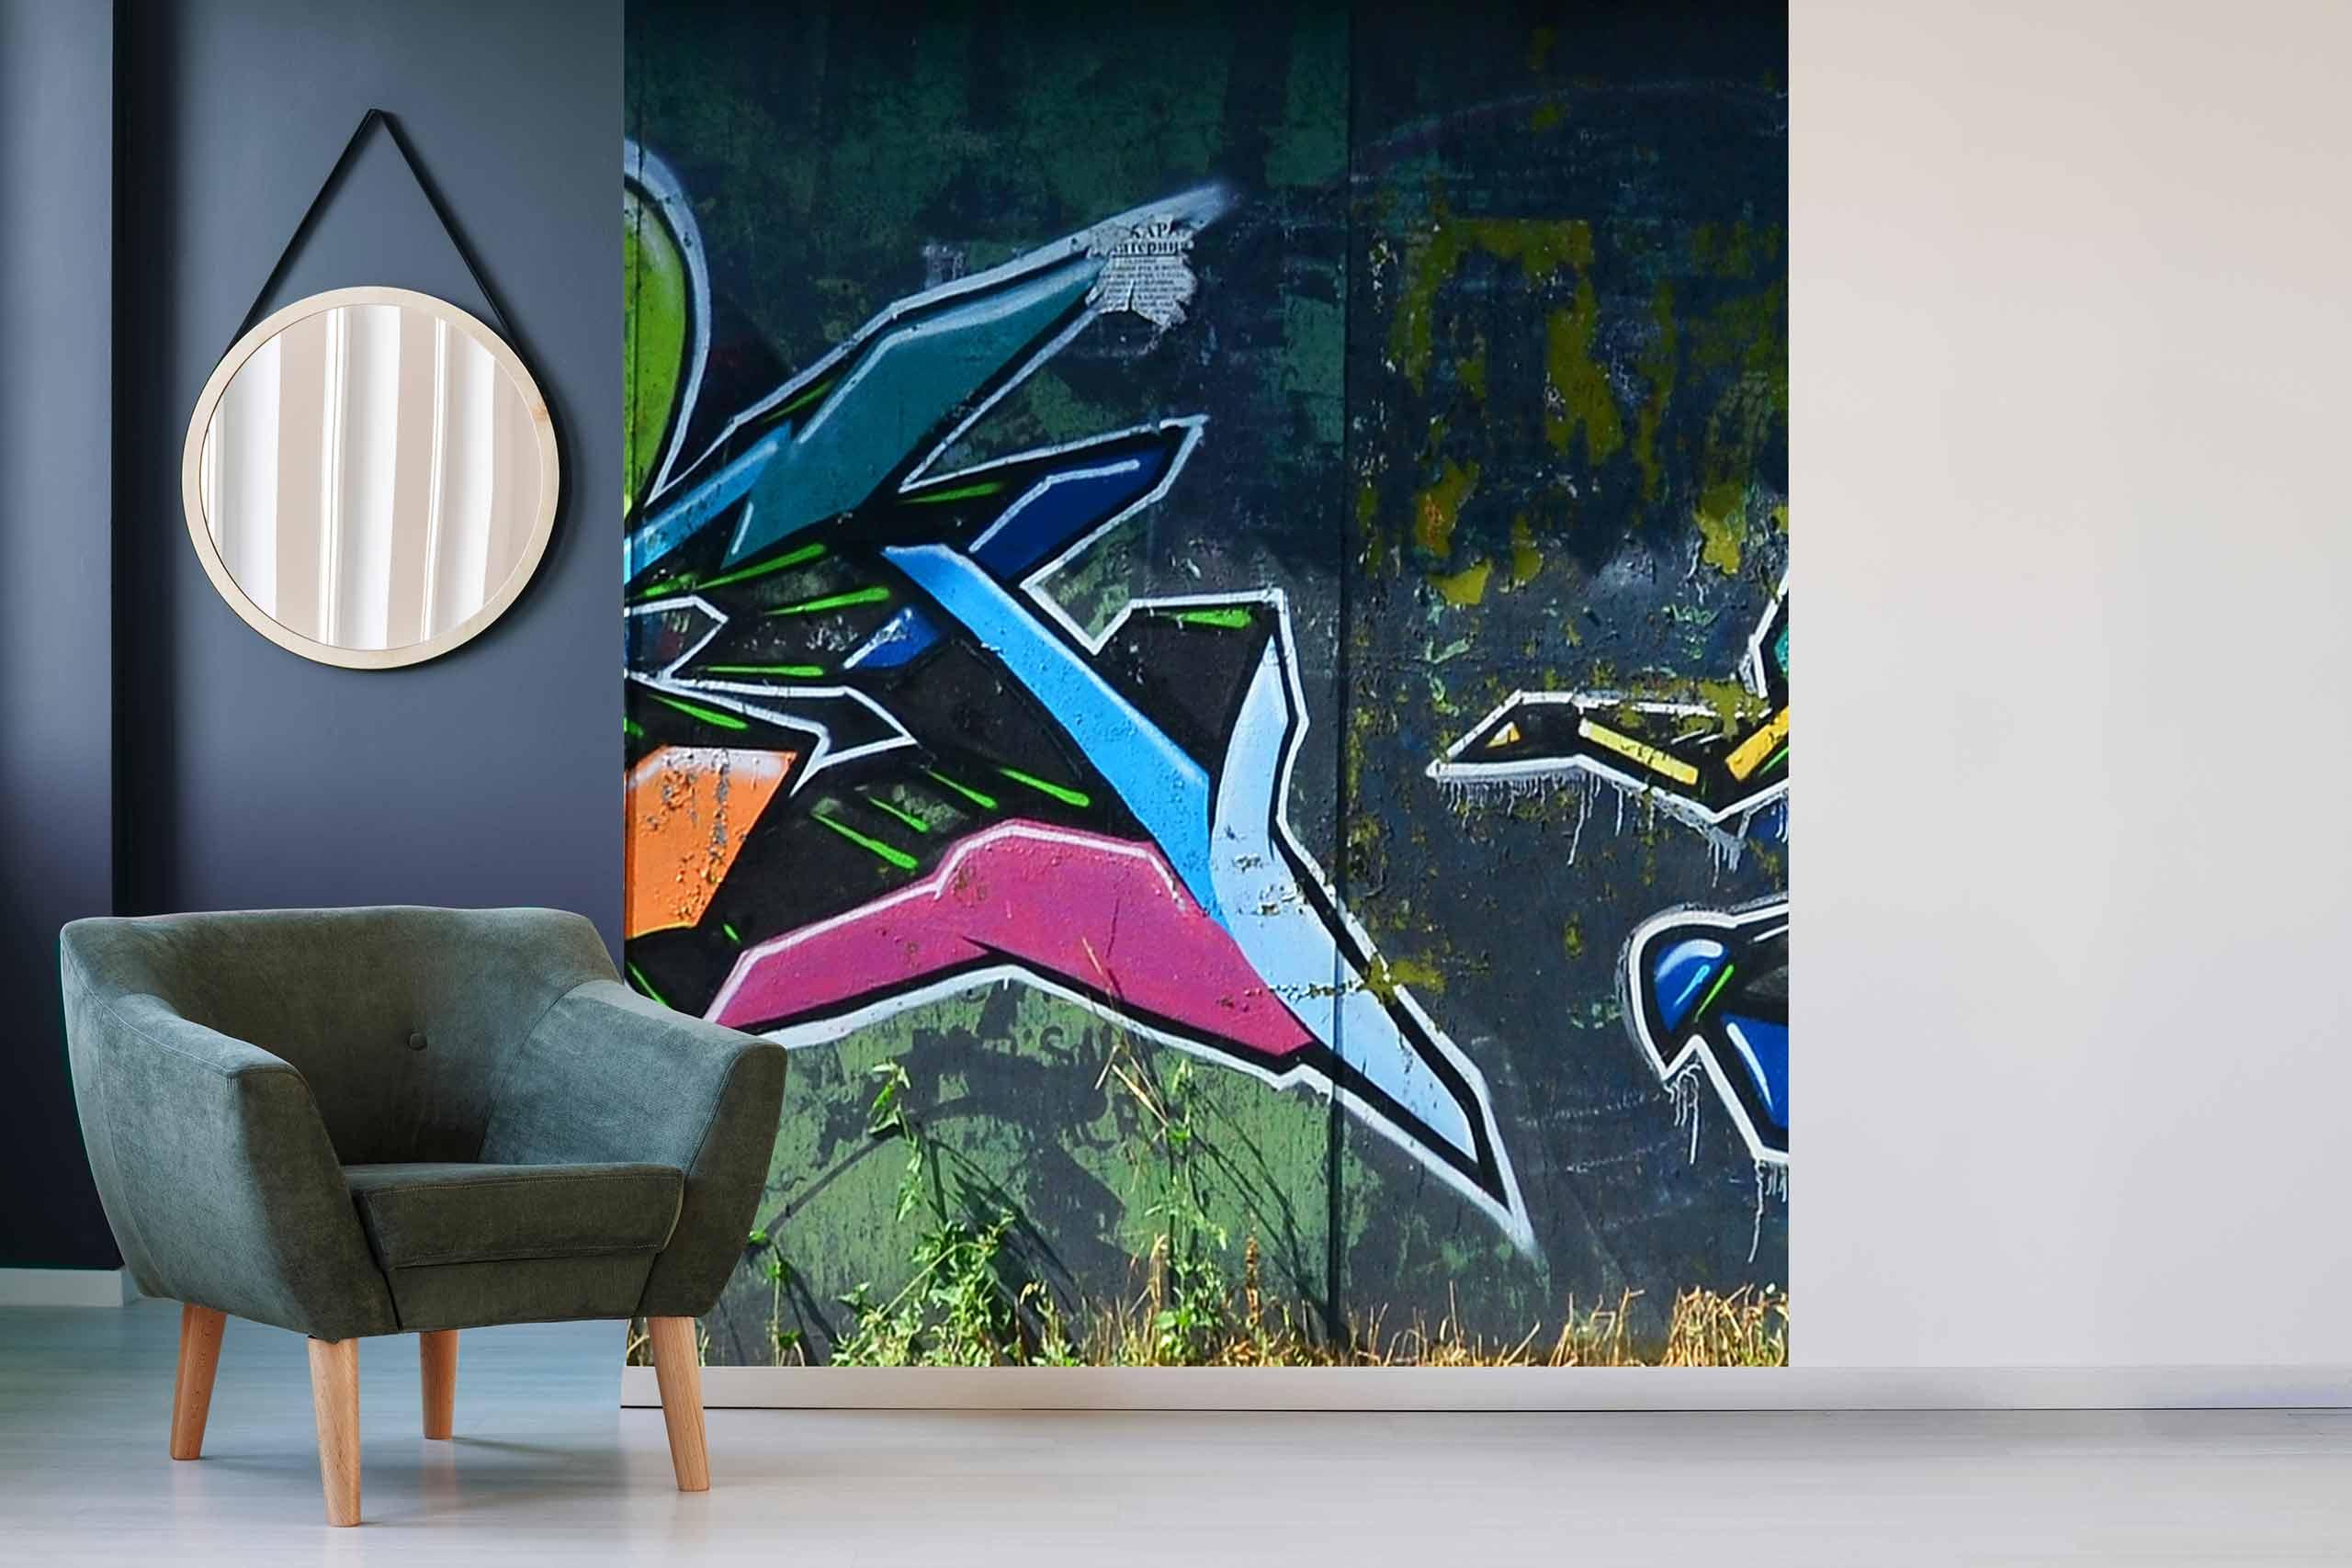 Vlies Tapete 225 Fototapete Höhe 250cm Motiv 139 Graffiti